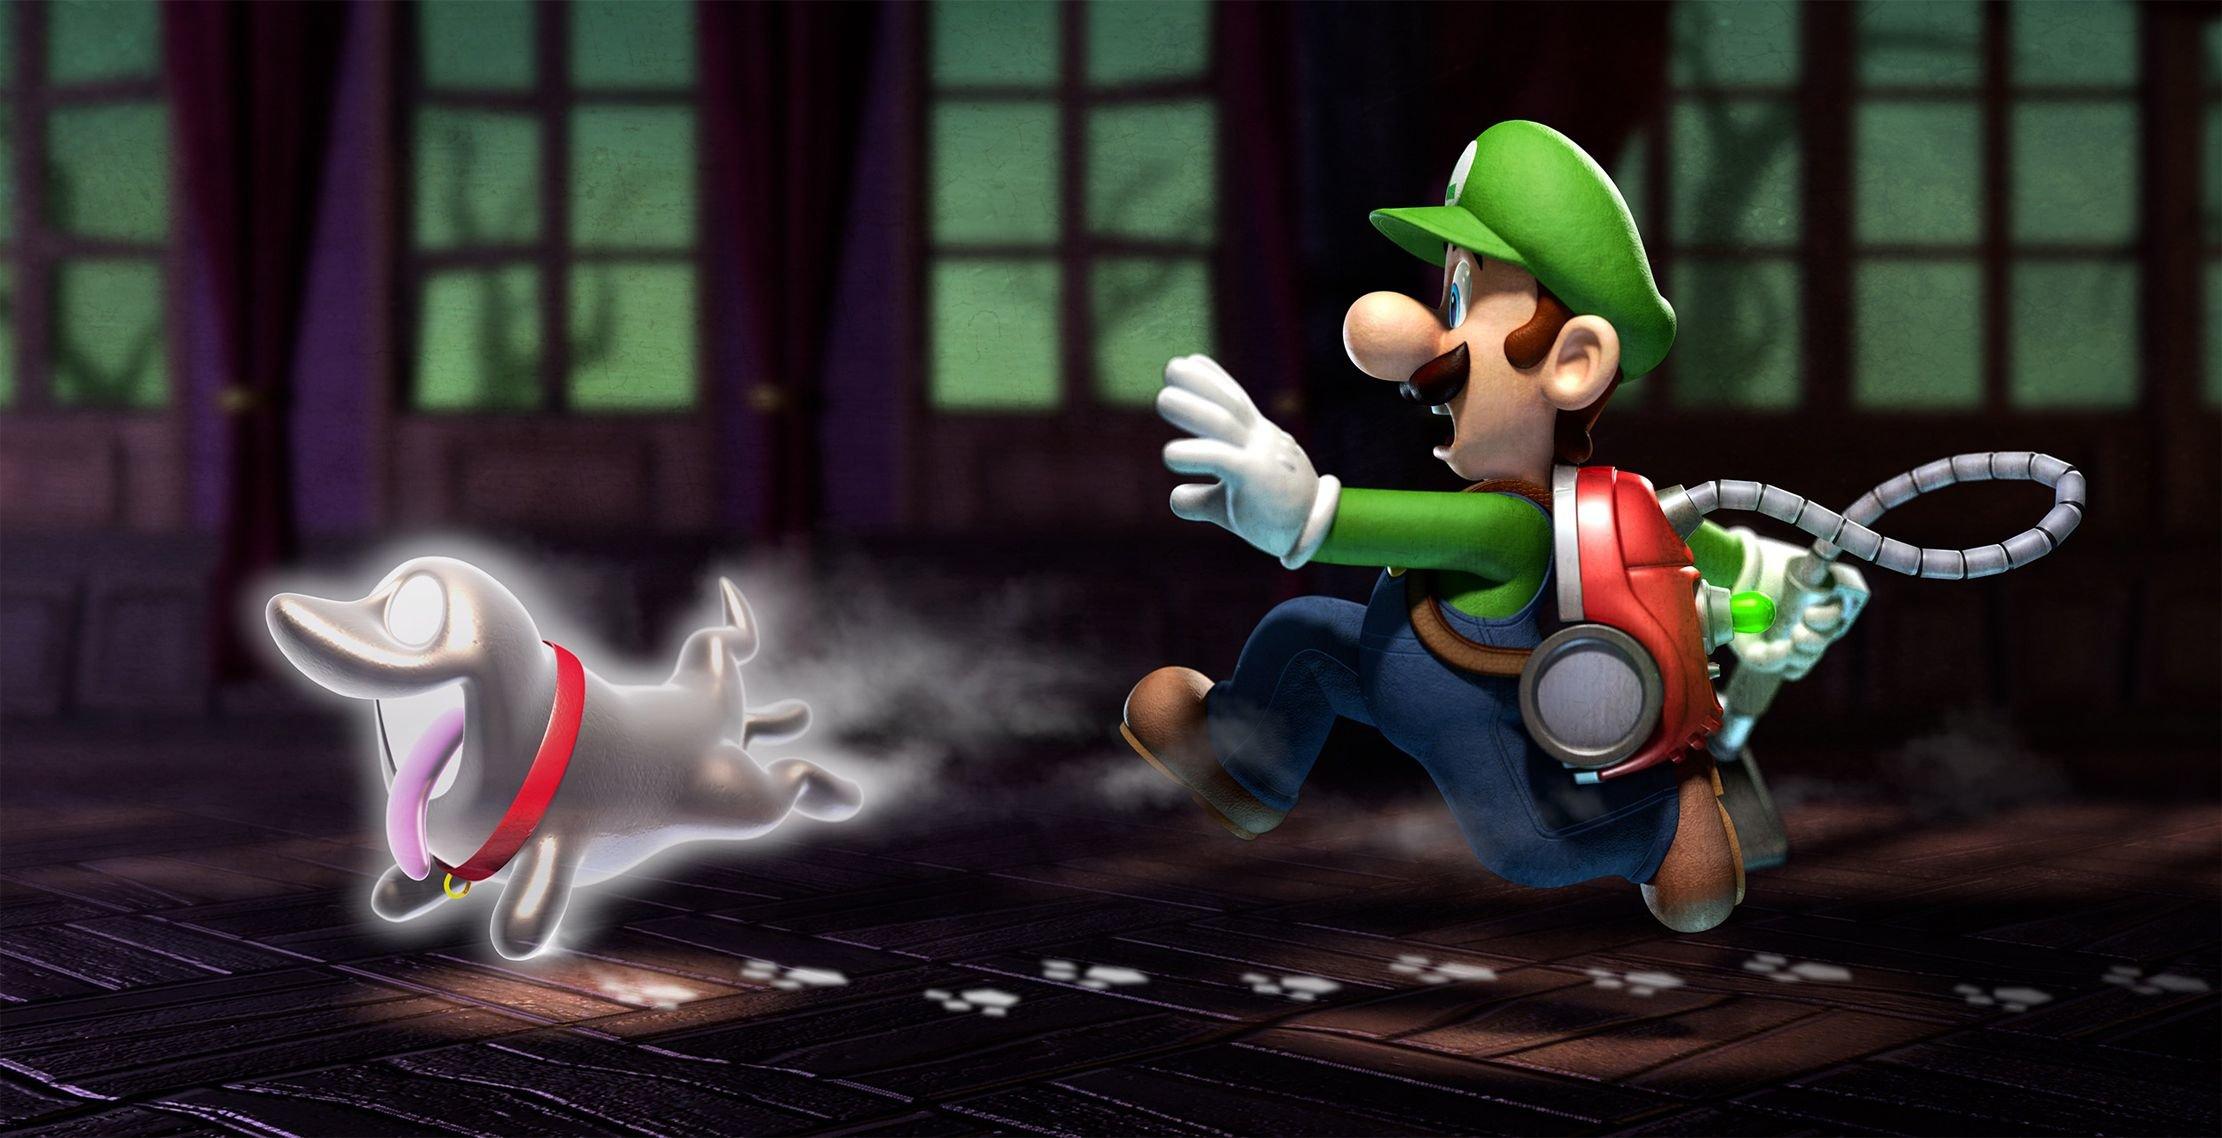 record: Luigi's Mansion 3 ו- Animal Crossing מגיעים לנינטנדו סוויץ' cover image